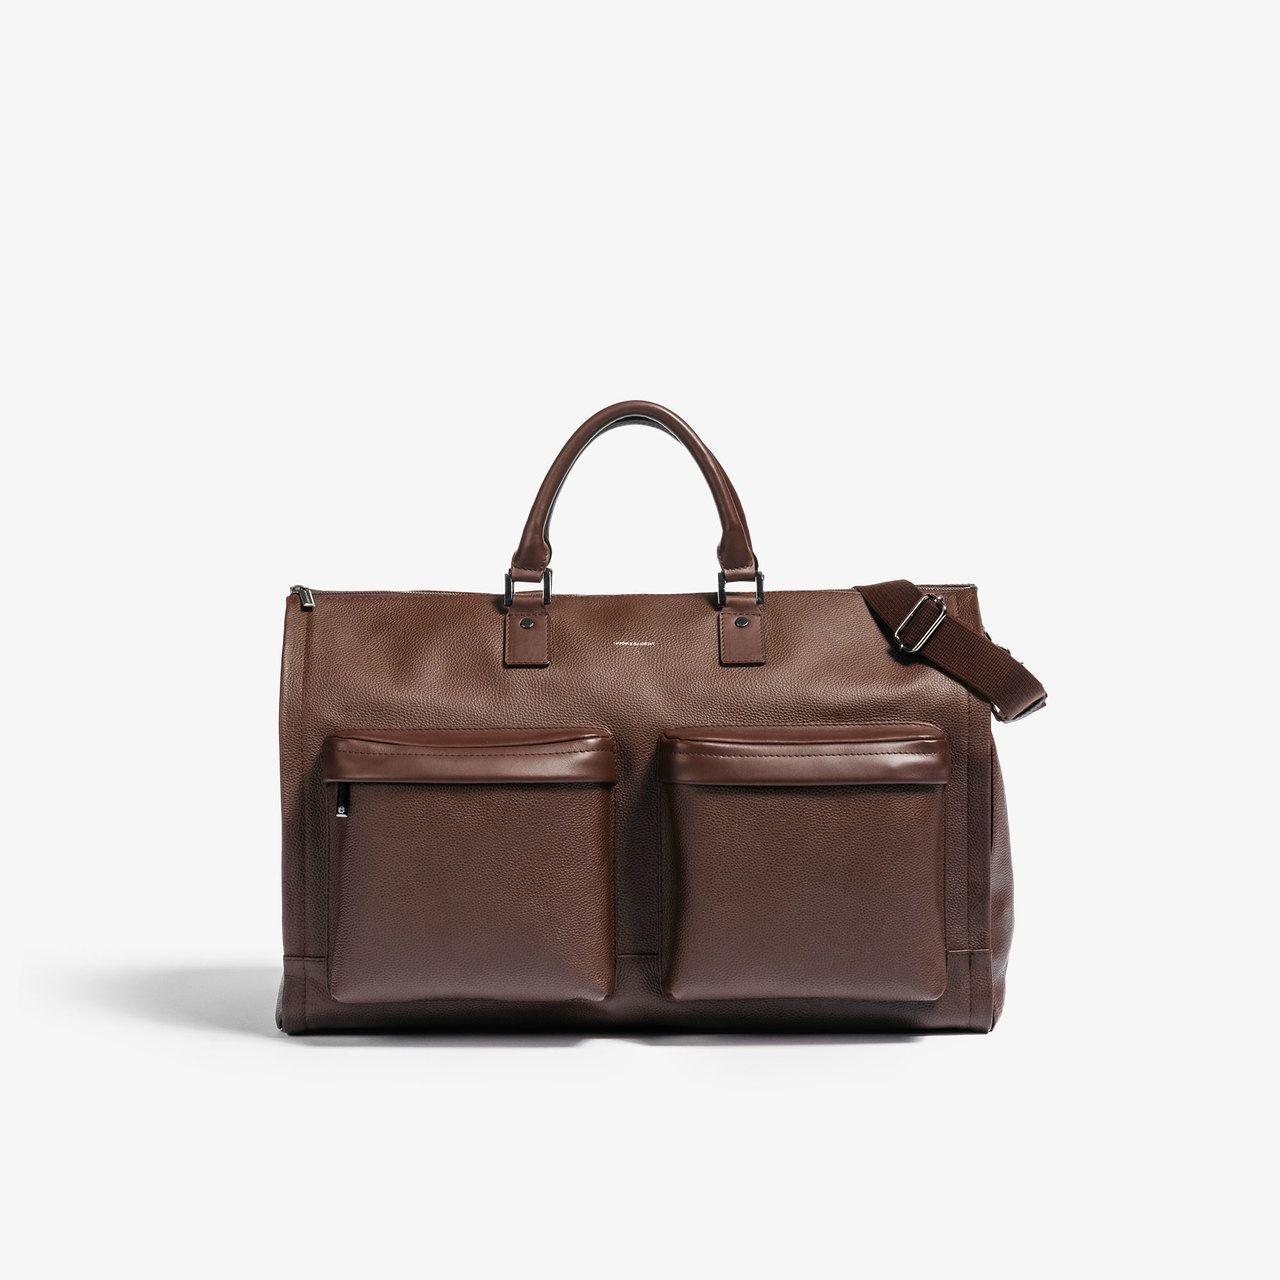 Floto Roma Travel Bag Saddle Brown Large Italian Leather Weekender Duffle 4046ROMA